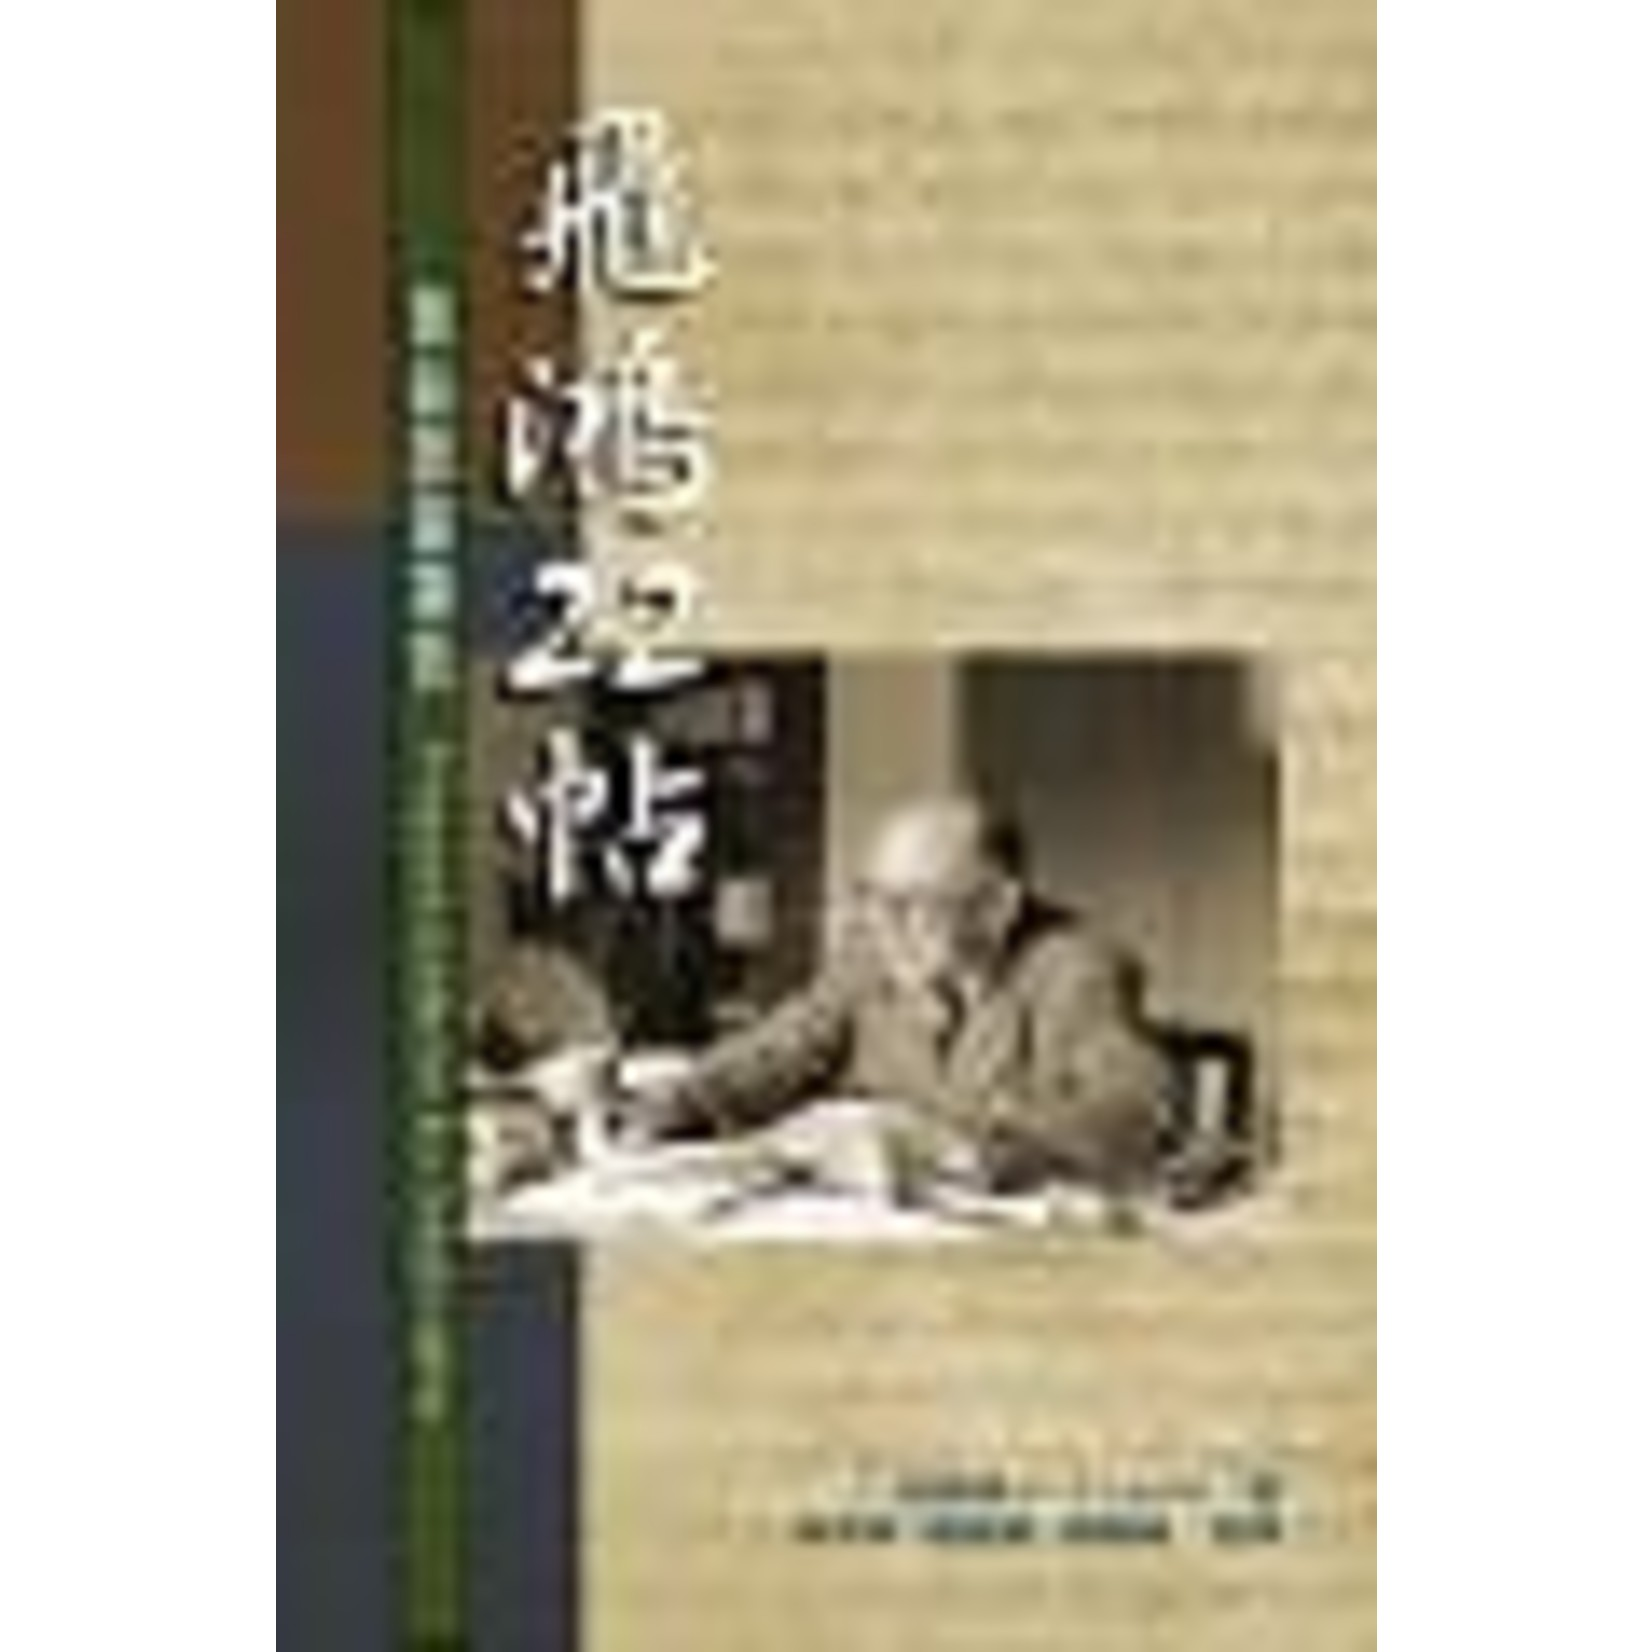 校園書房 Campus Books 飛鴻22帖:魯益師論禱告 Prayer: Letters to Malcolm